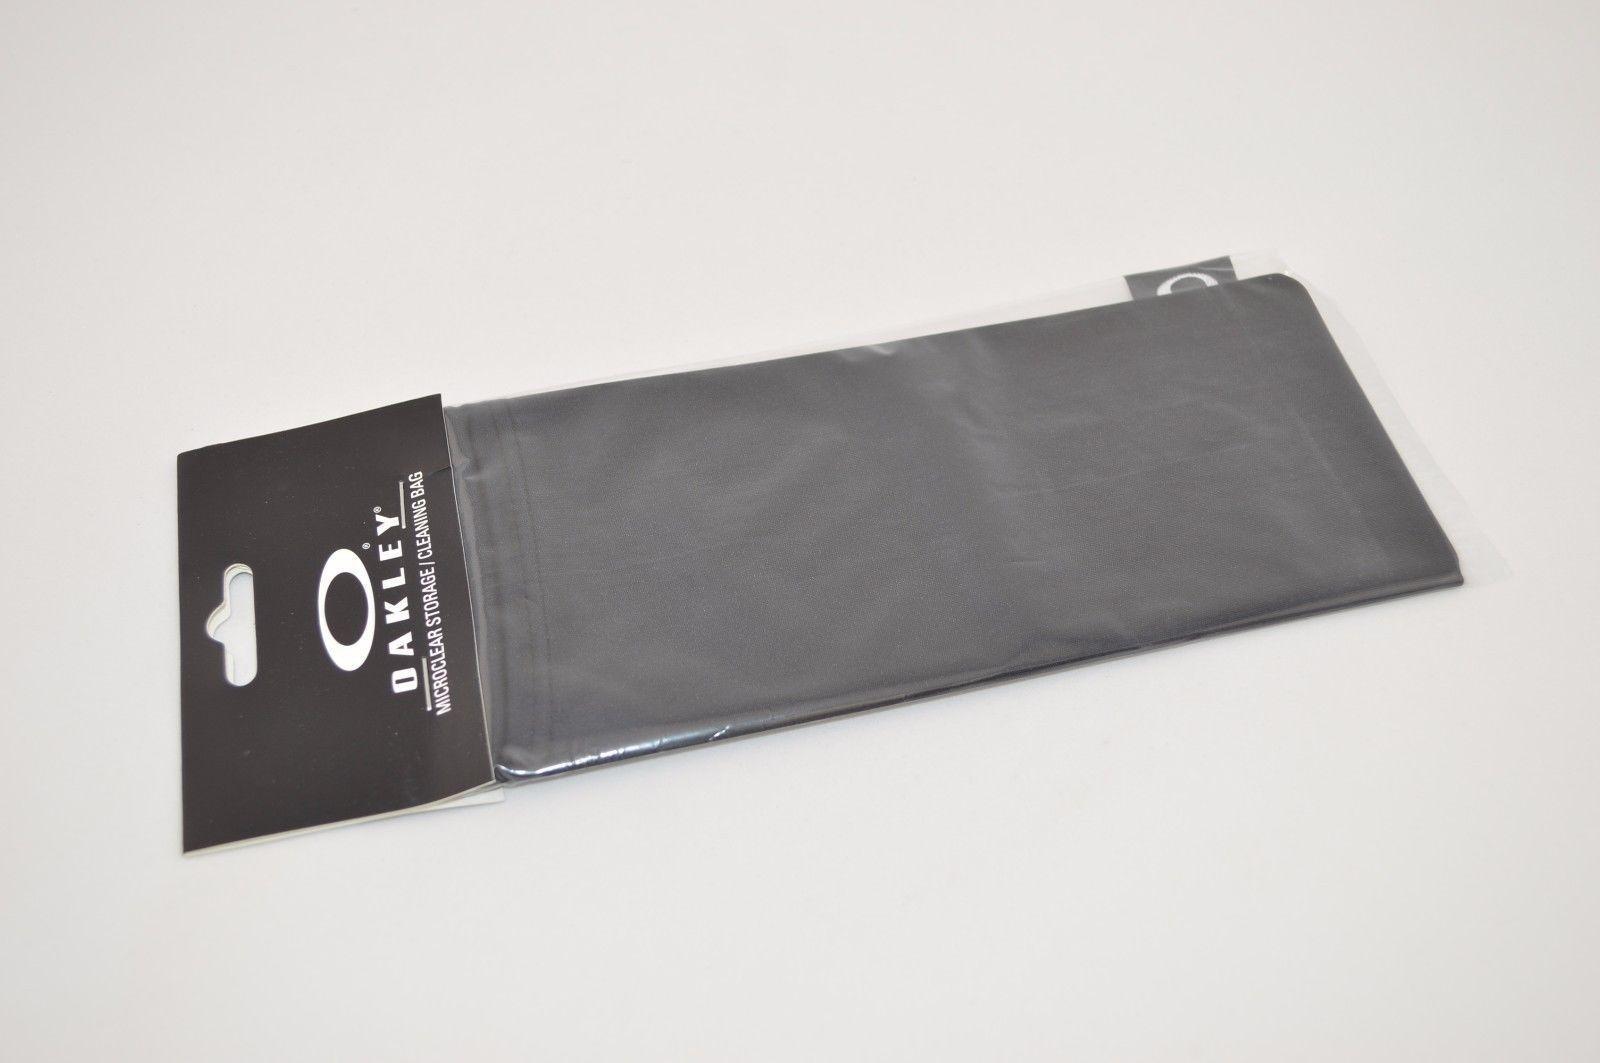 Funda Oakley Microfibra 06-587 Microclear Cleaning/Store Bag